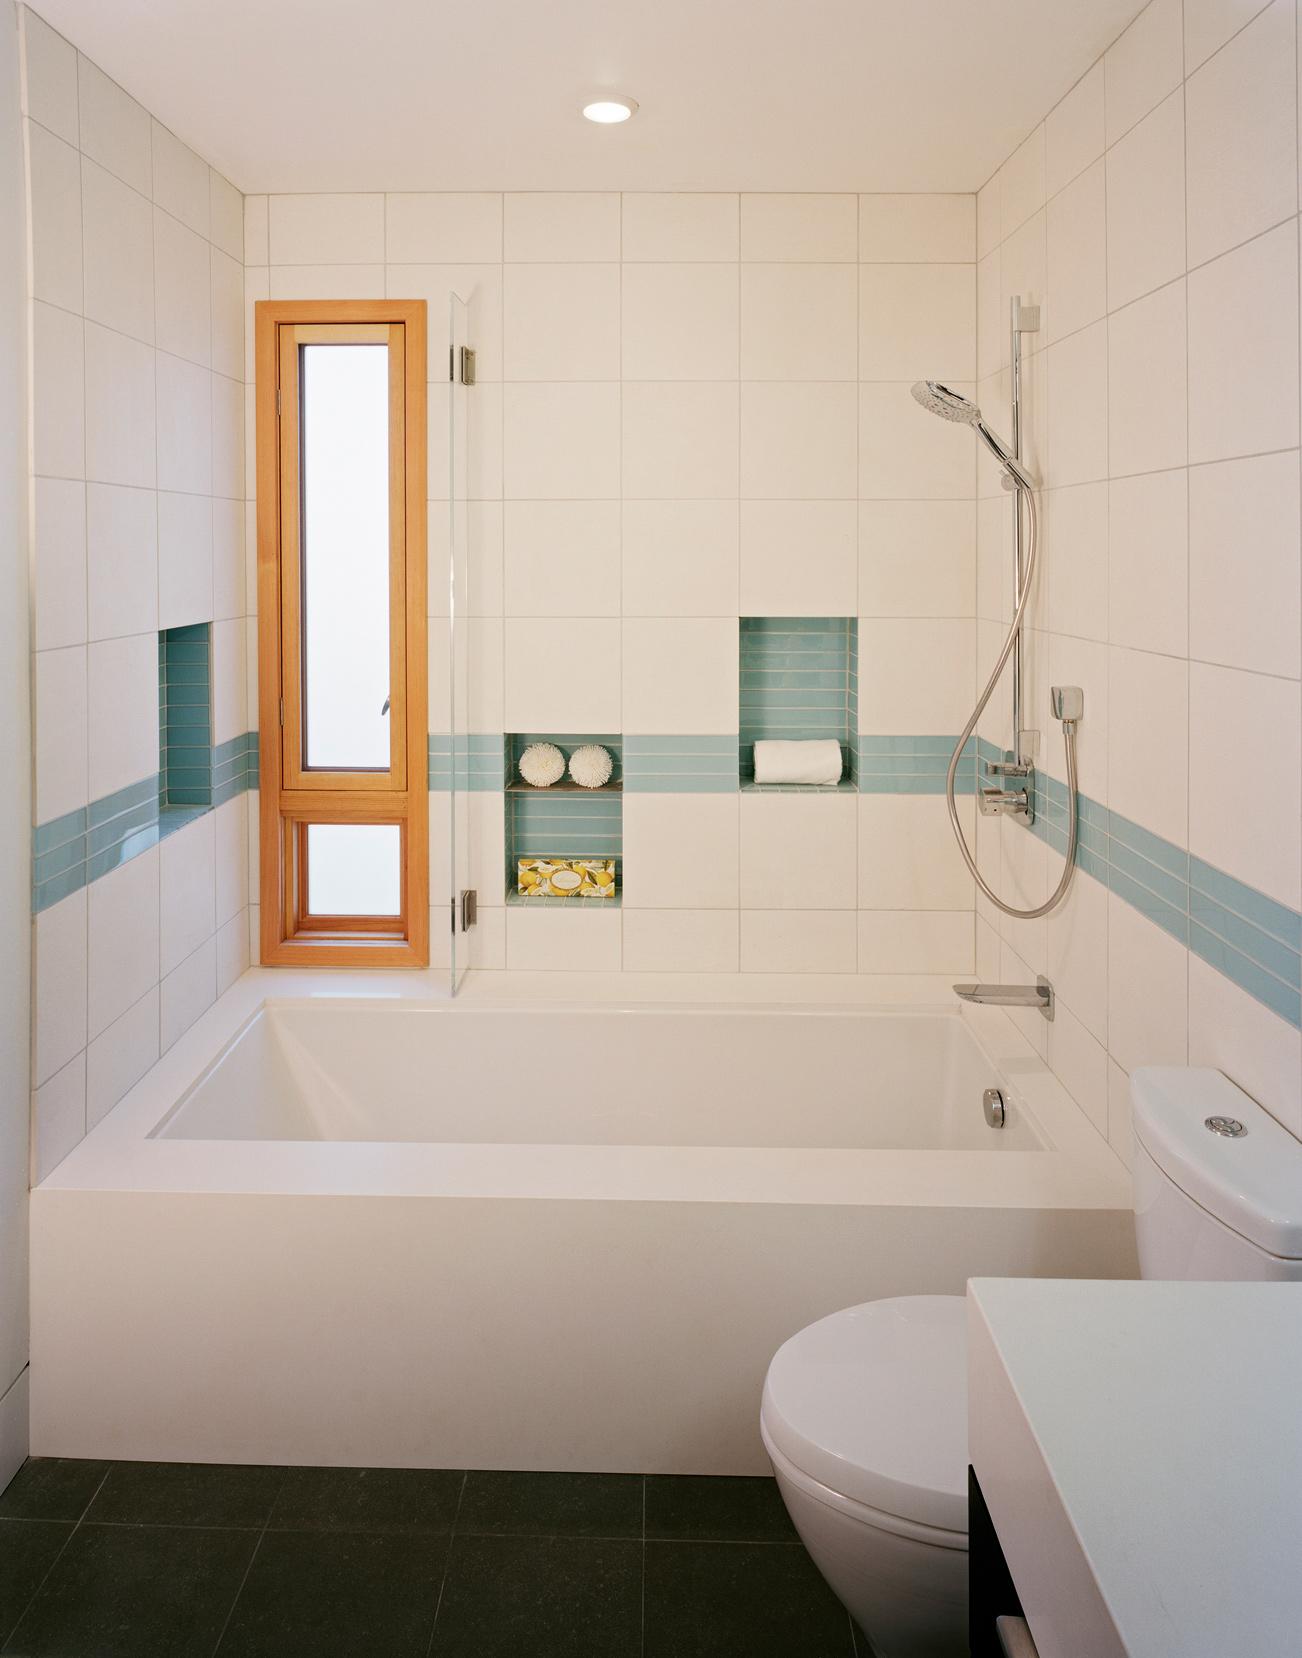 Guest-bathroom-in-new-modern-house.jpg